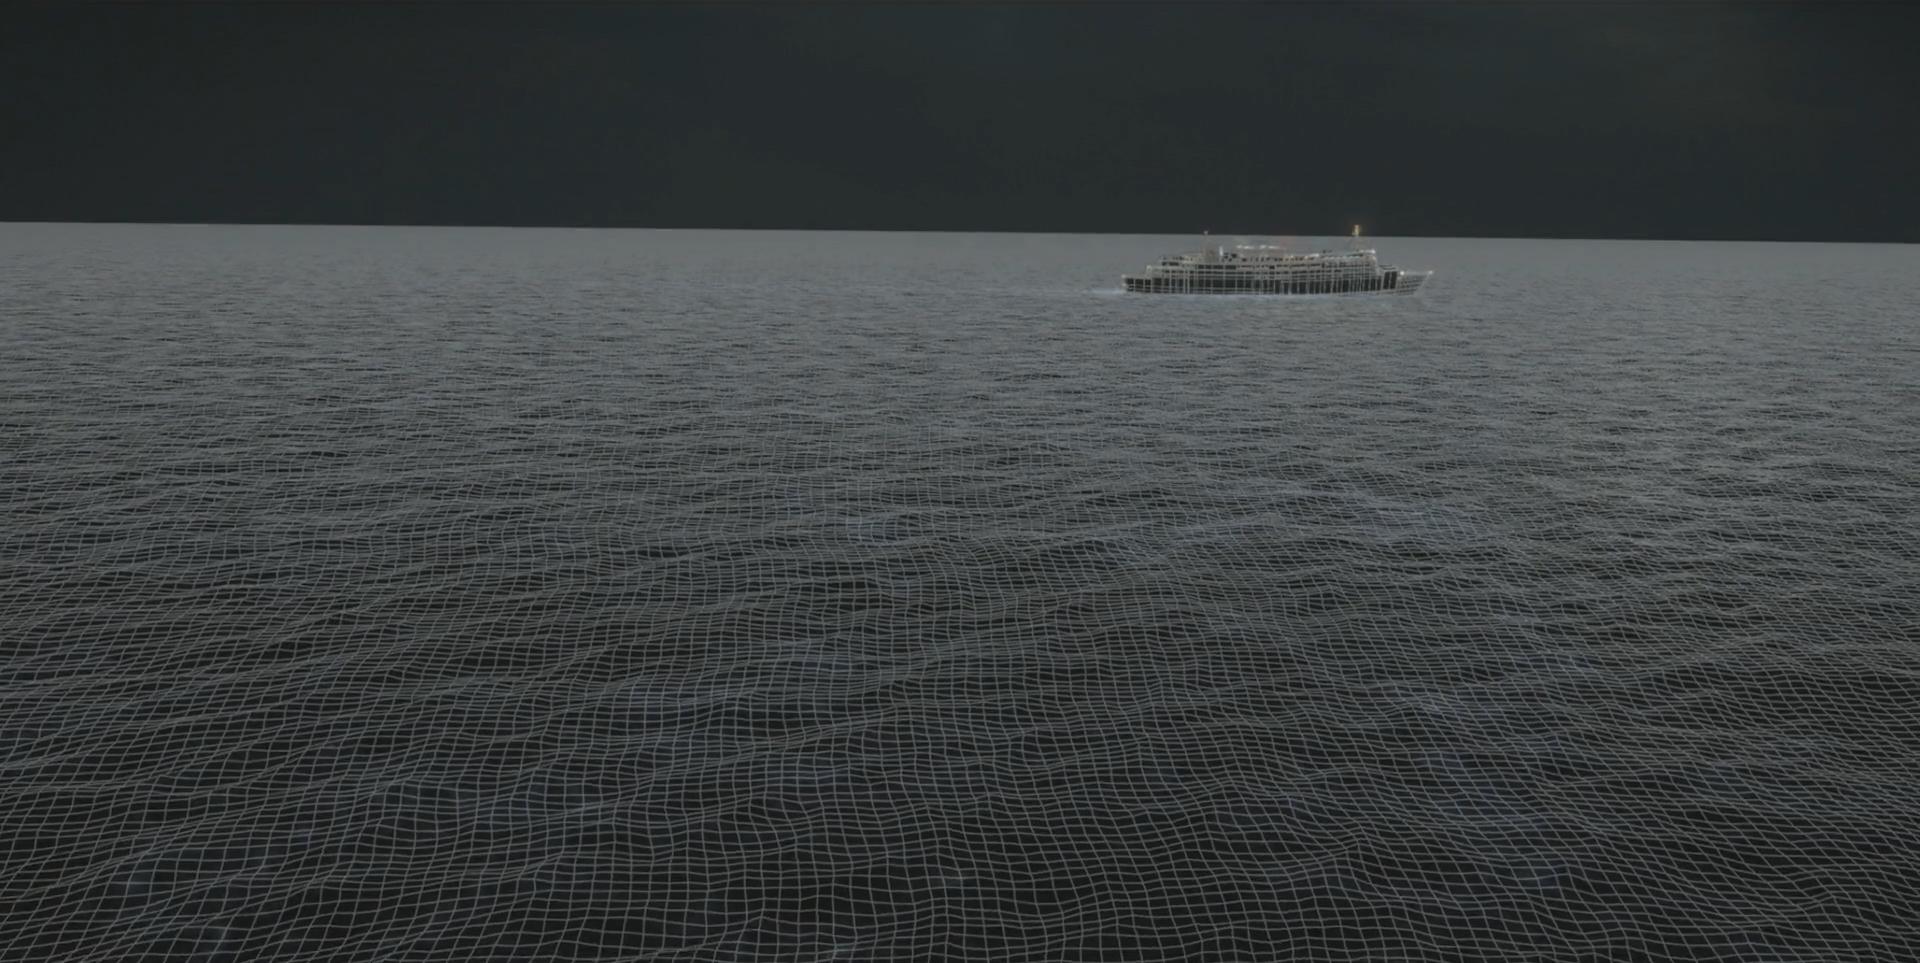 3D model + environment